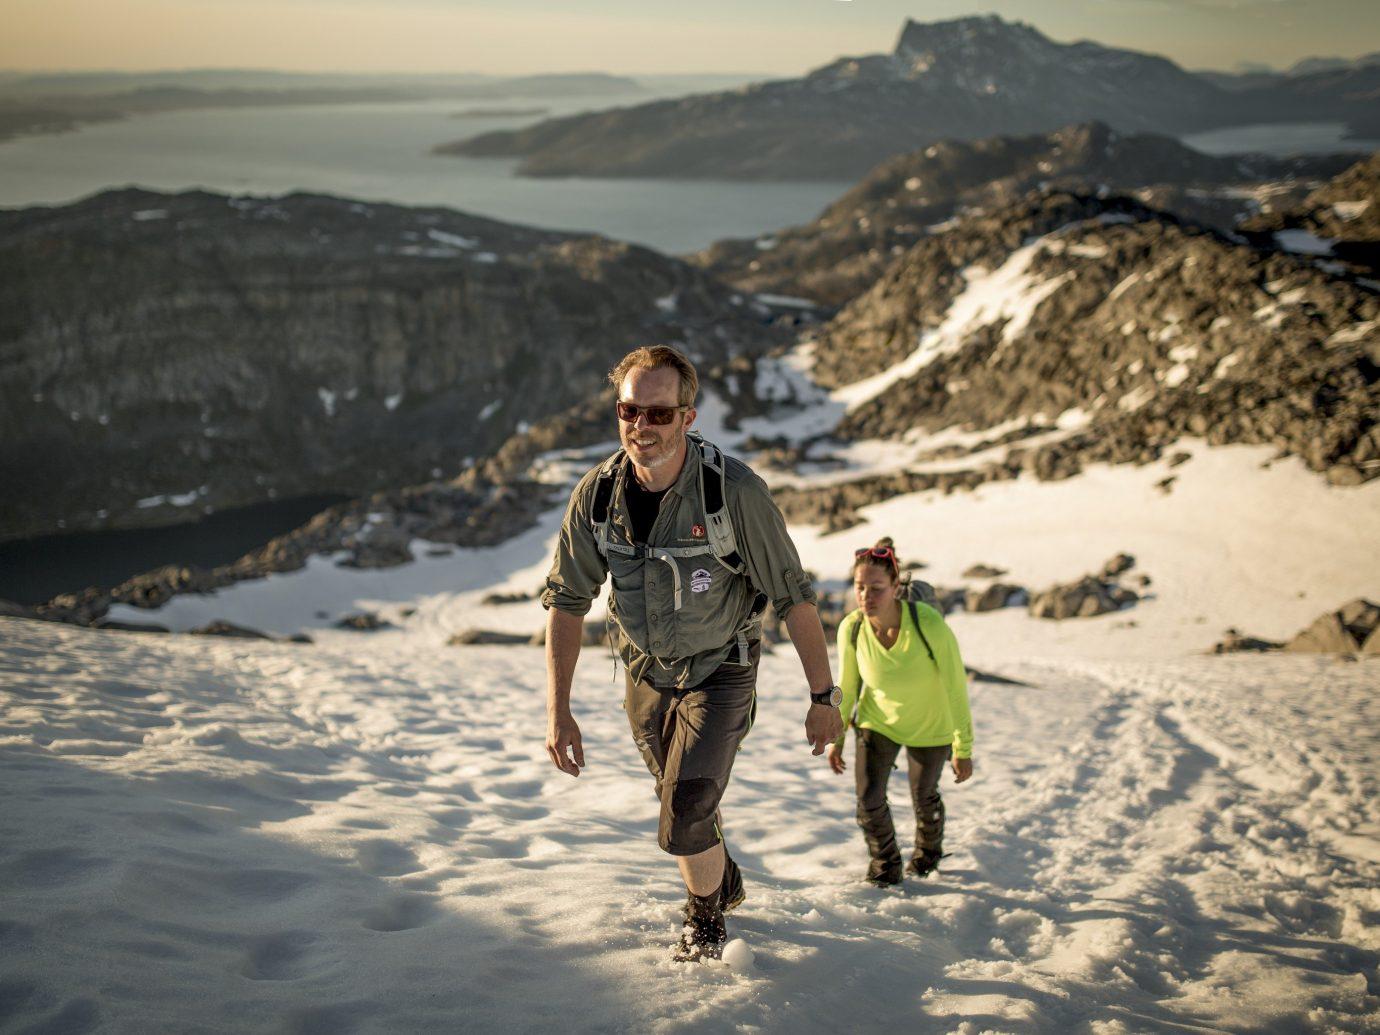 Trip Ideas outdoor snow mountain Nature mountainous landforms person Winter weather season vacation walking mountain range Adventure Sea mountaineering summit slope